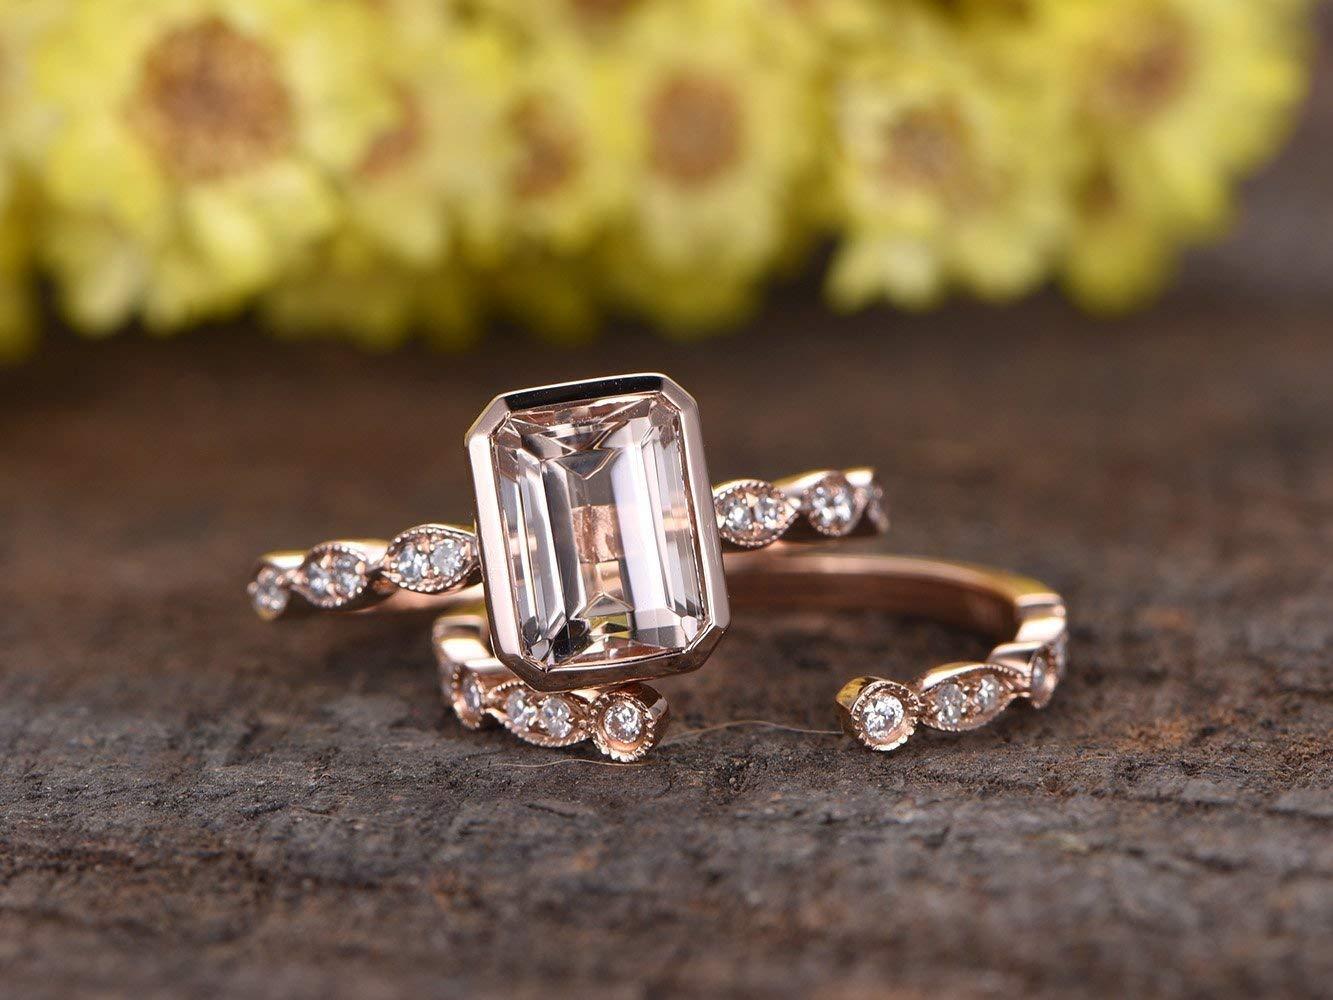 Marquise Moissanite Engagement Ring White Gold Over Bridal Set 2pcs Antique Art Deco Wedding Band Women Matching Moissanite Rings Stacking